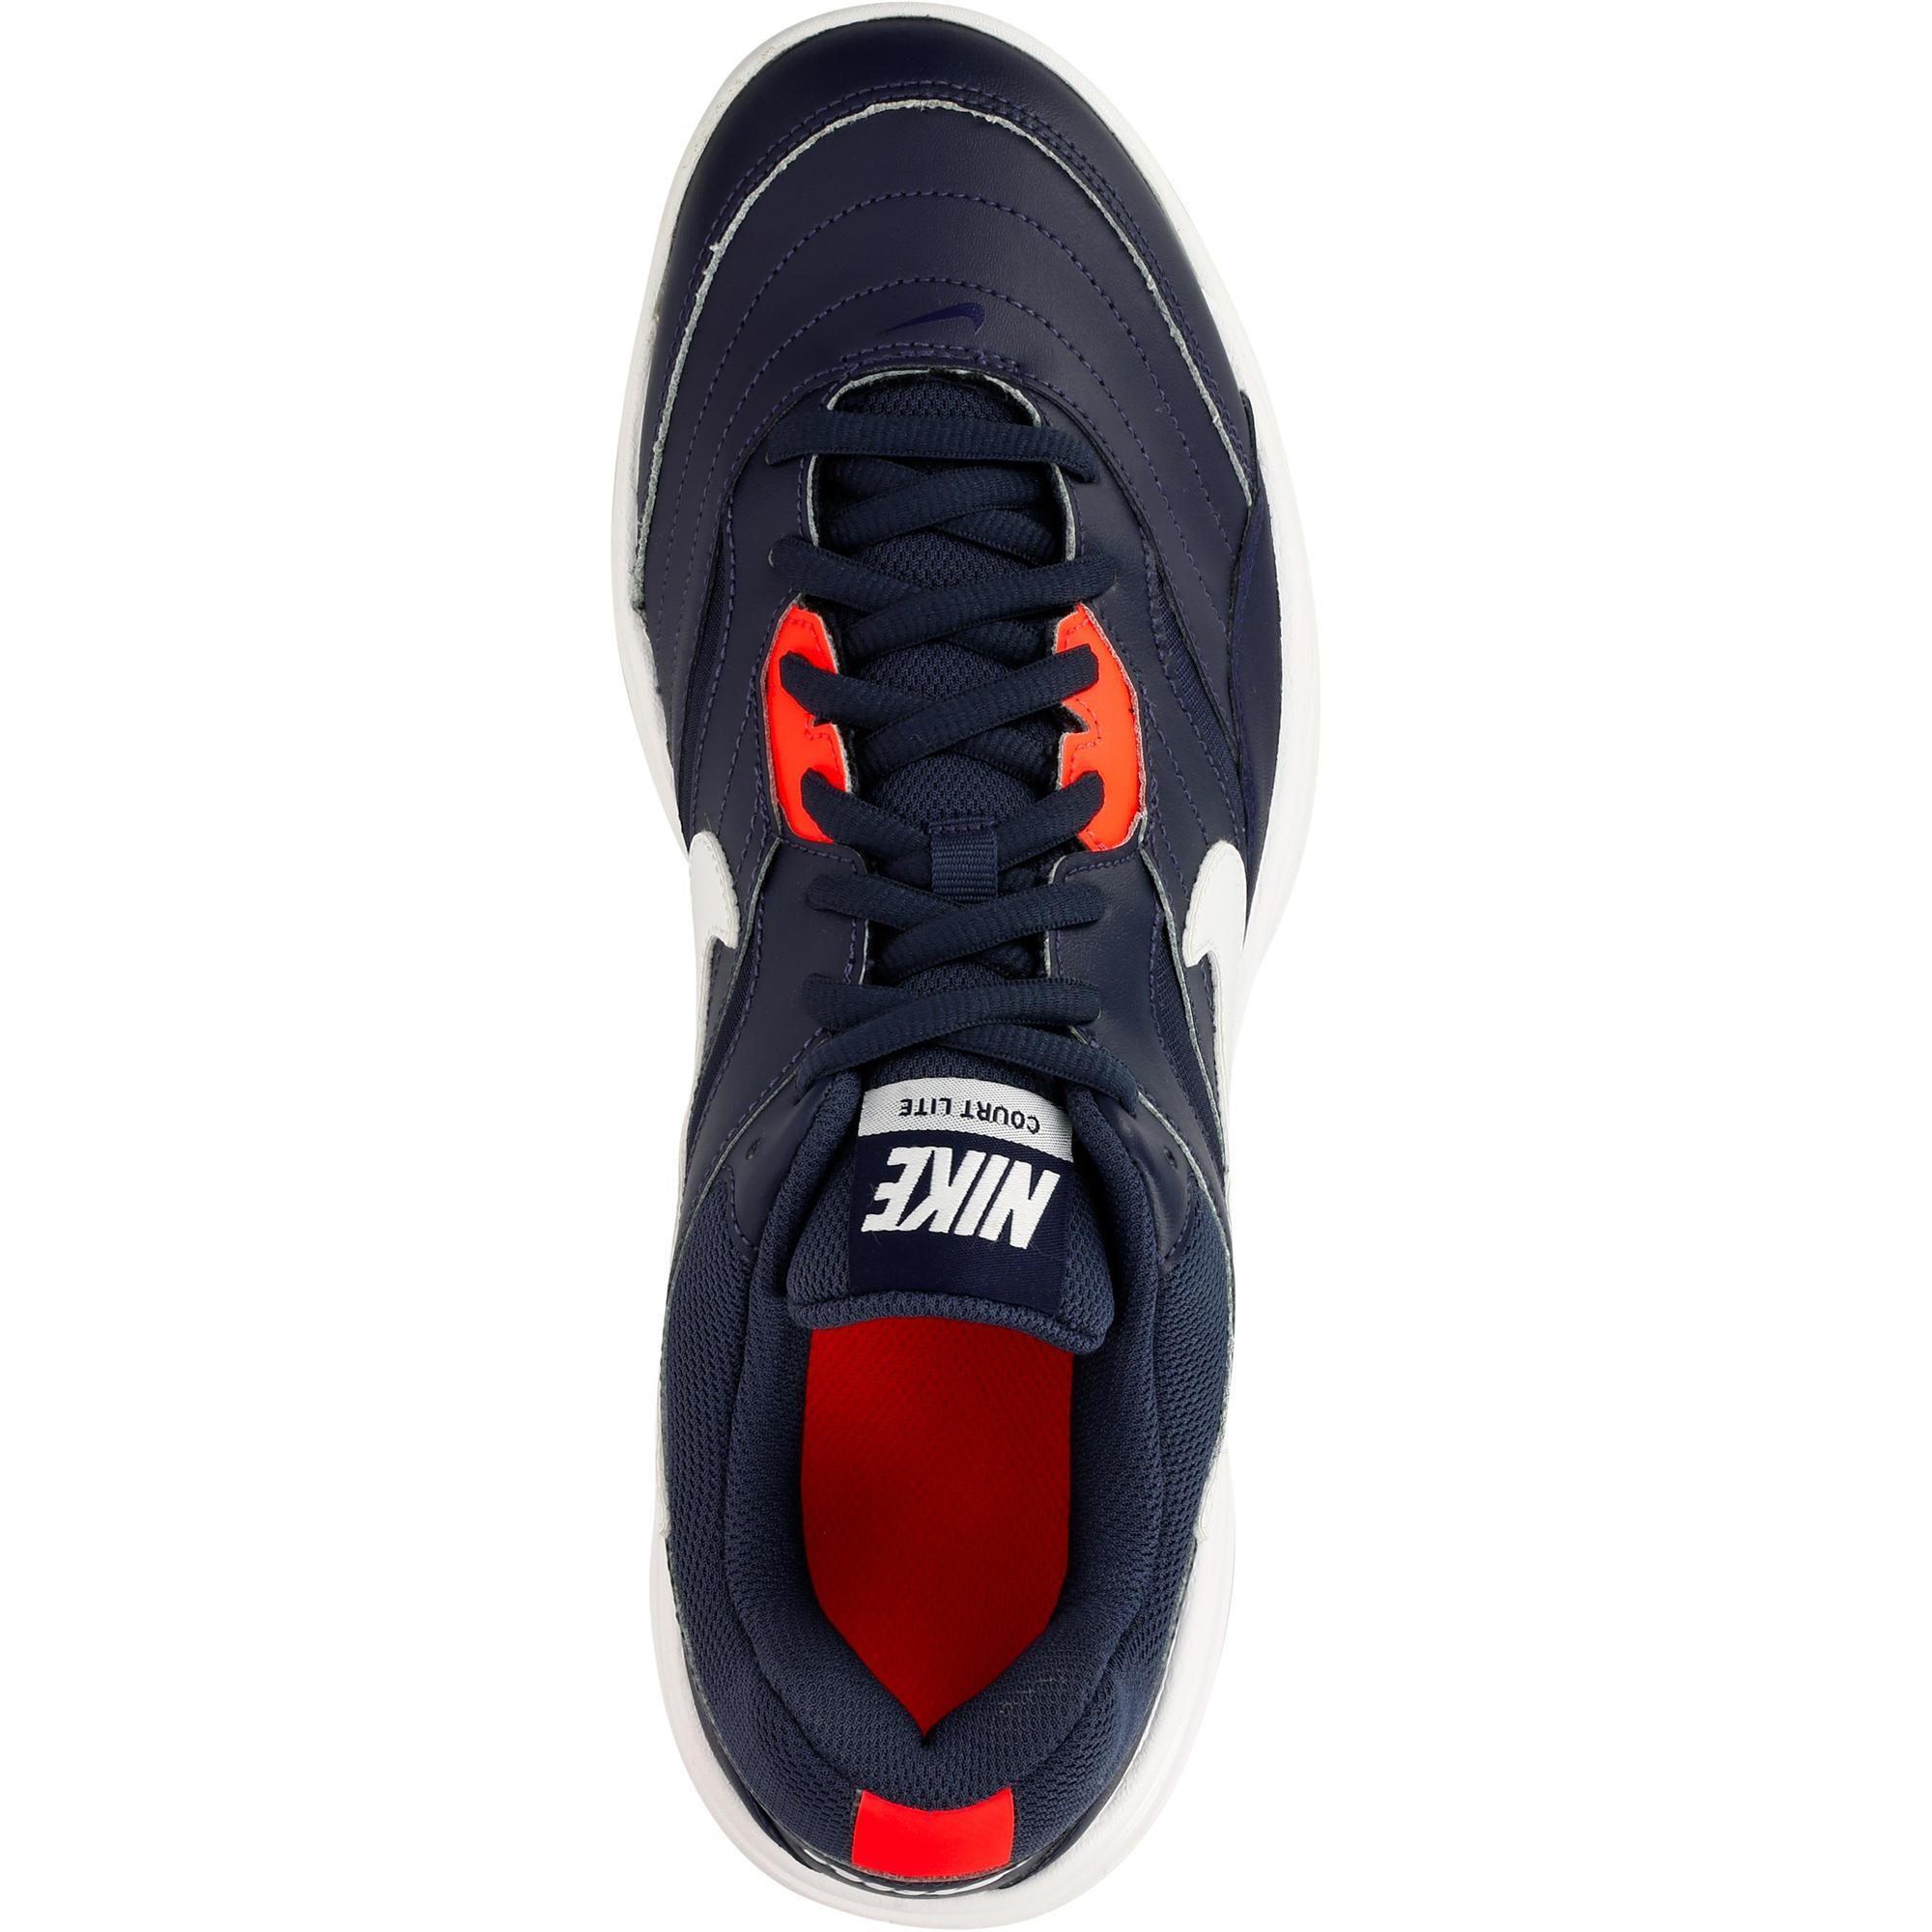 bdeda6498119 Court Terre Lite Decathlon Bleu Battue Chaussures Nike Tennis qH0qIPwFd